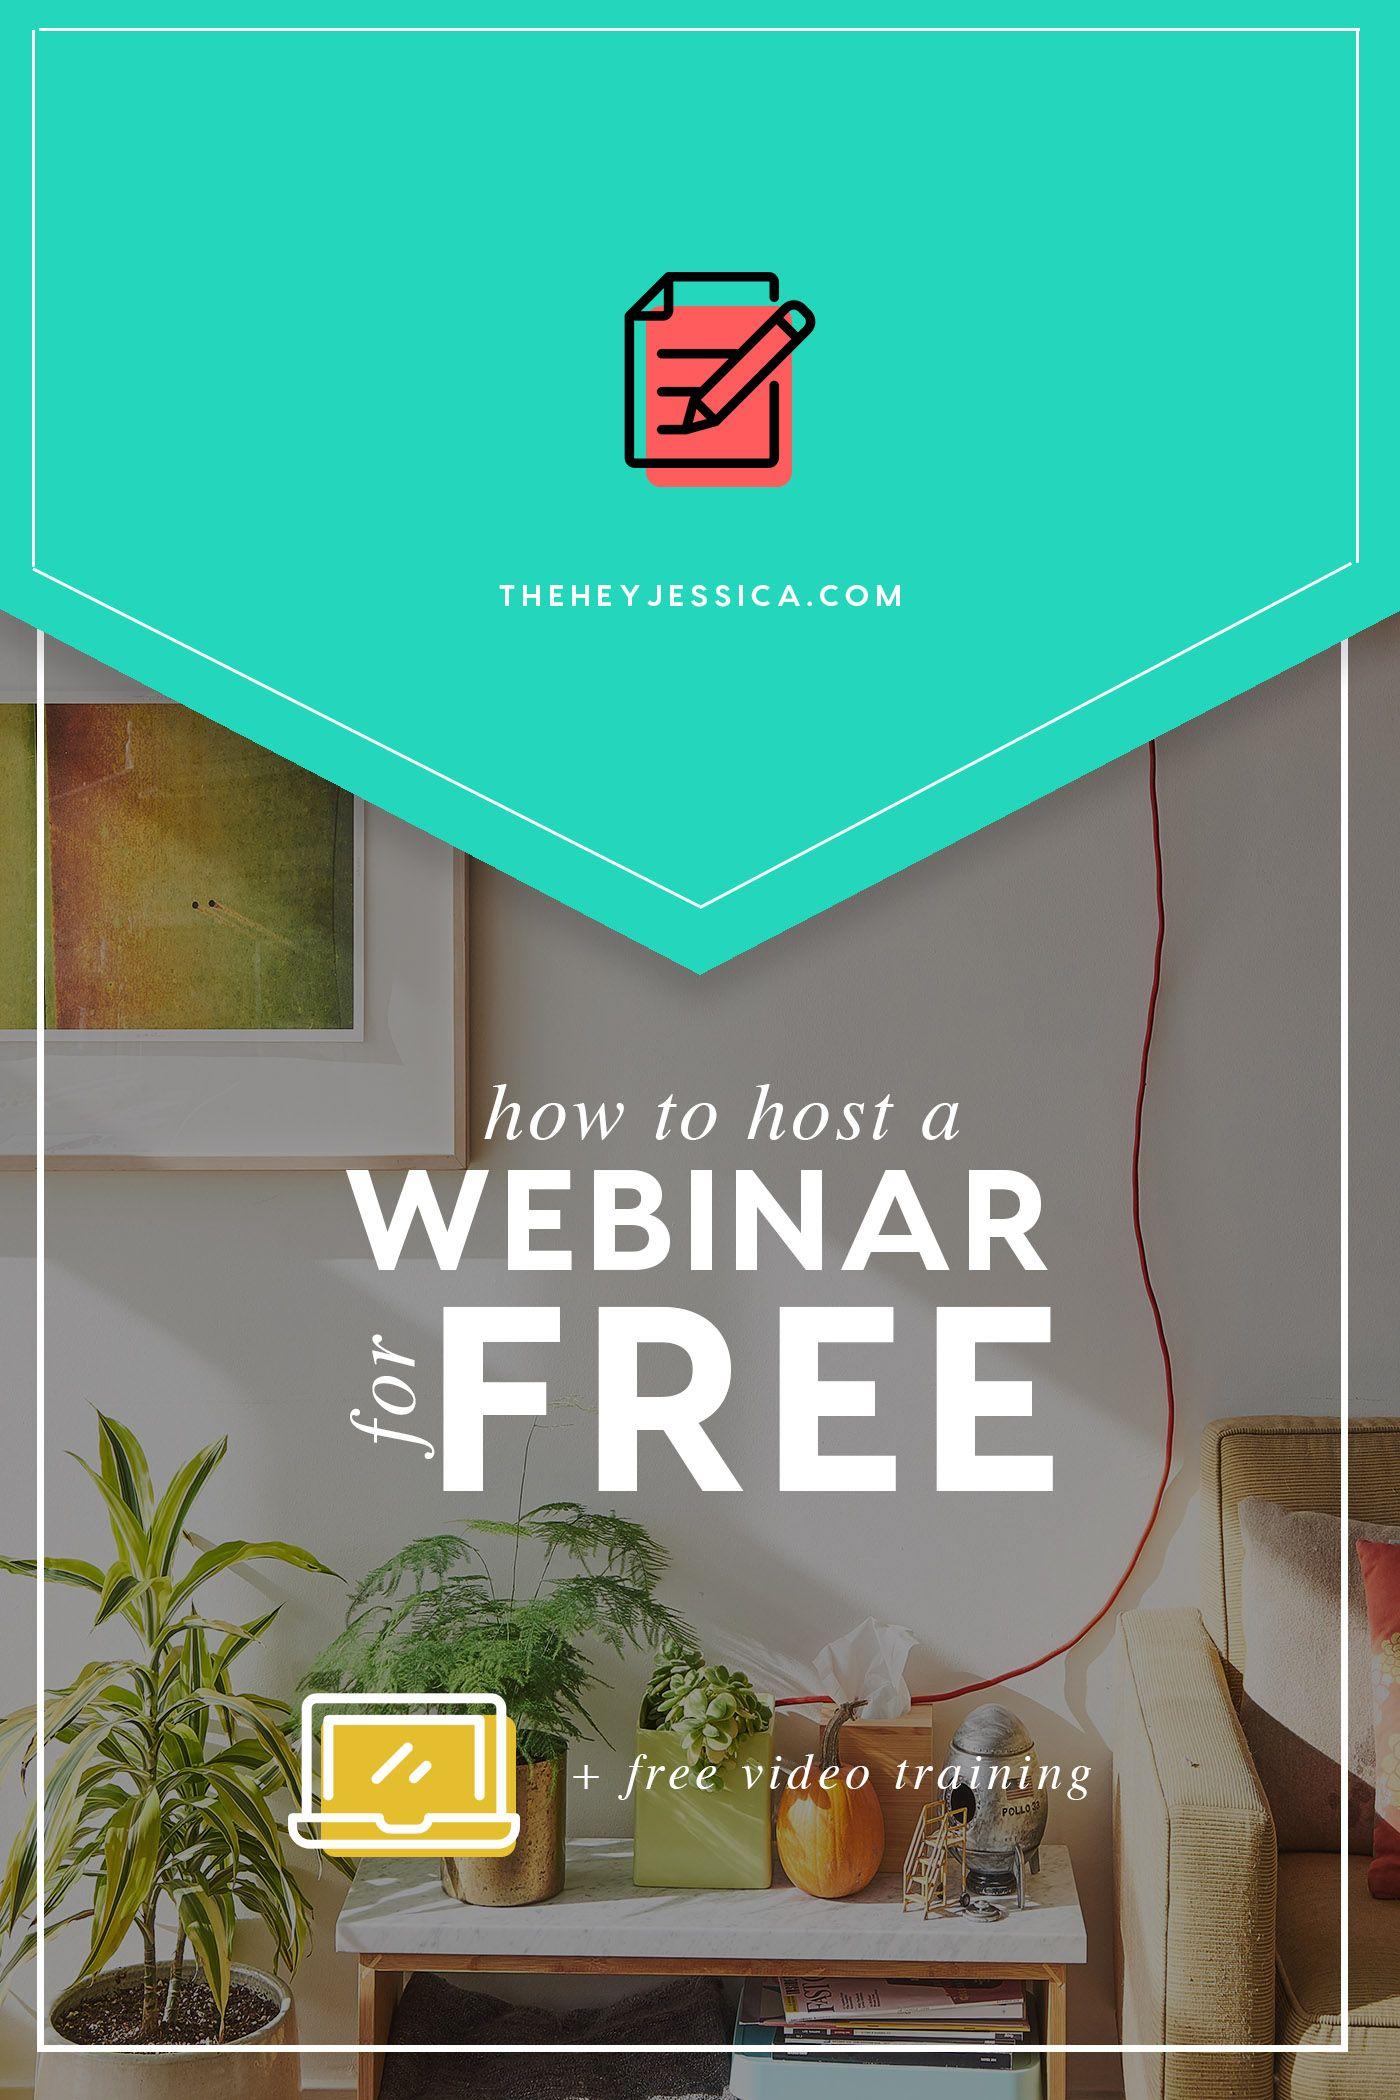 How To Host A Webinar On Youtube For Free Jessica Stansberry Webinar Webinar Design Webinar Marketing